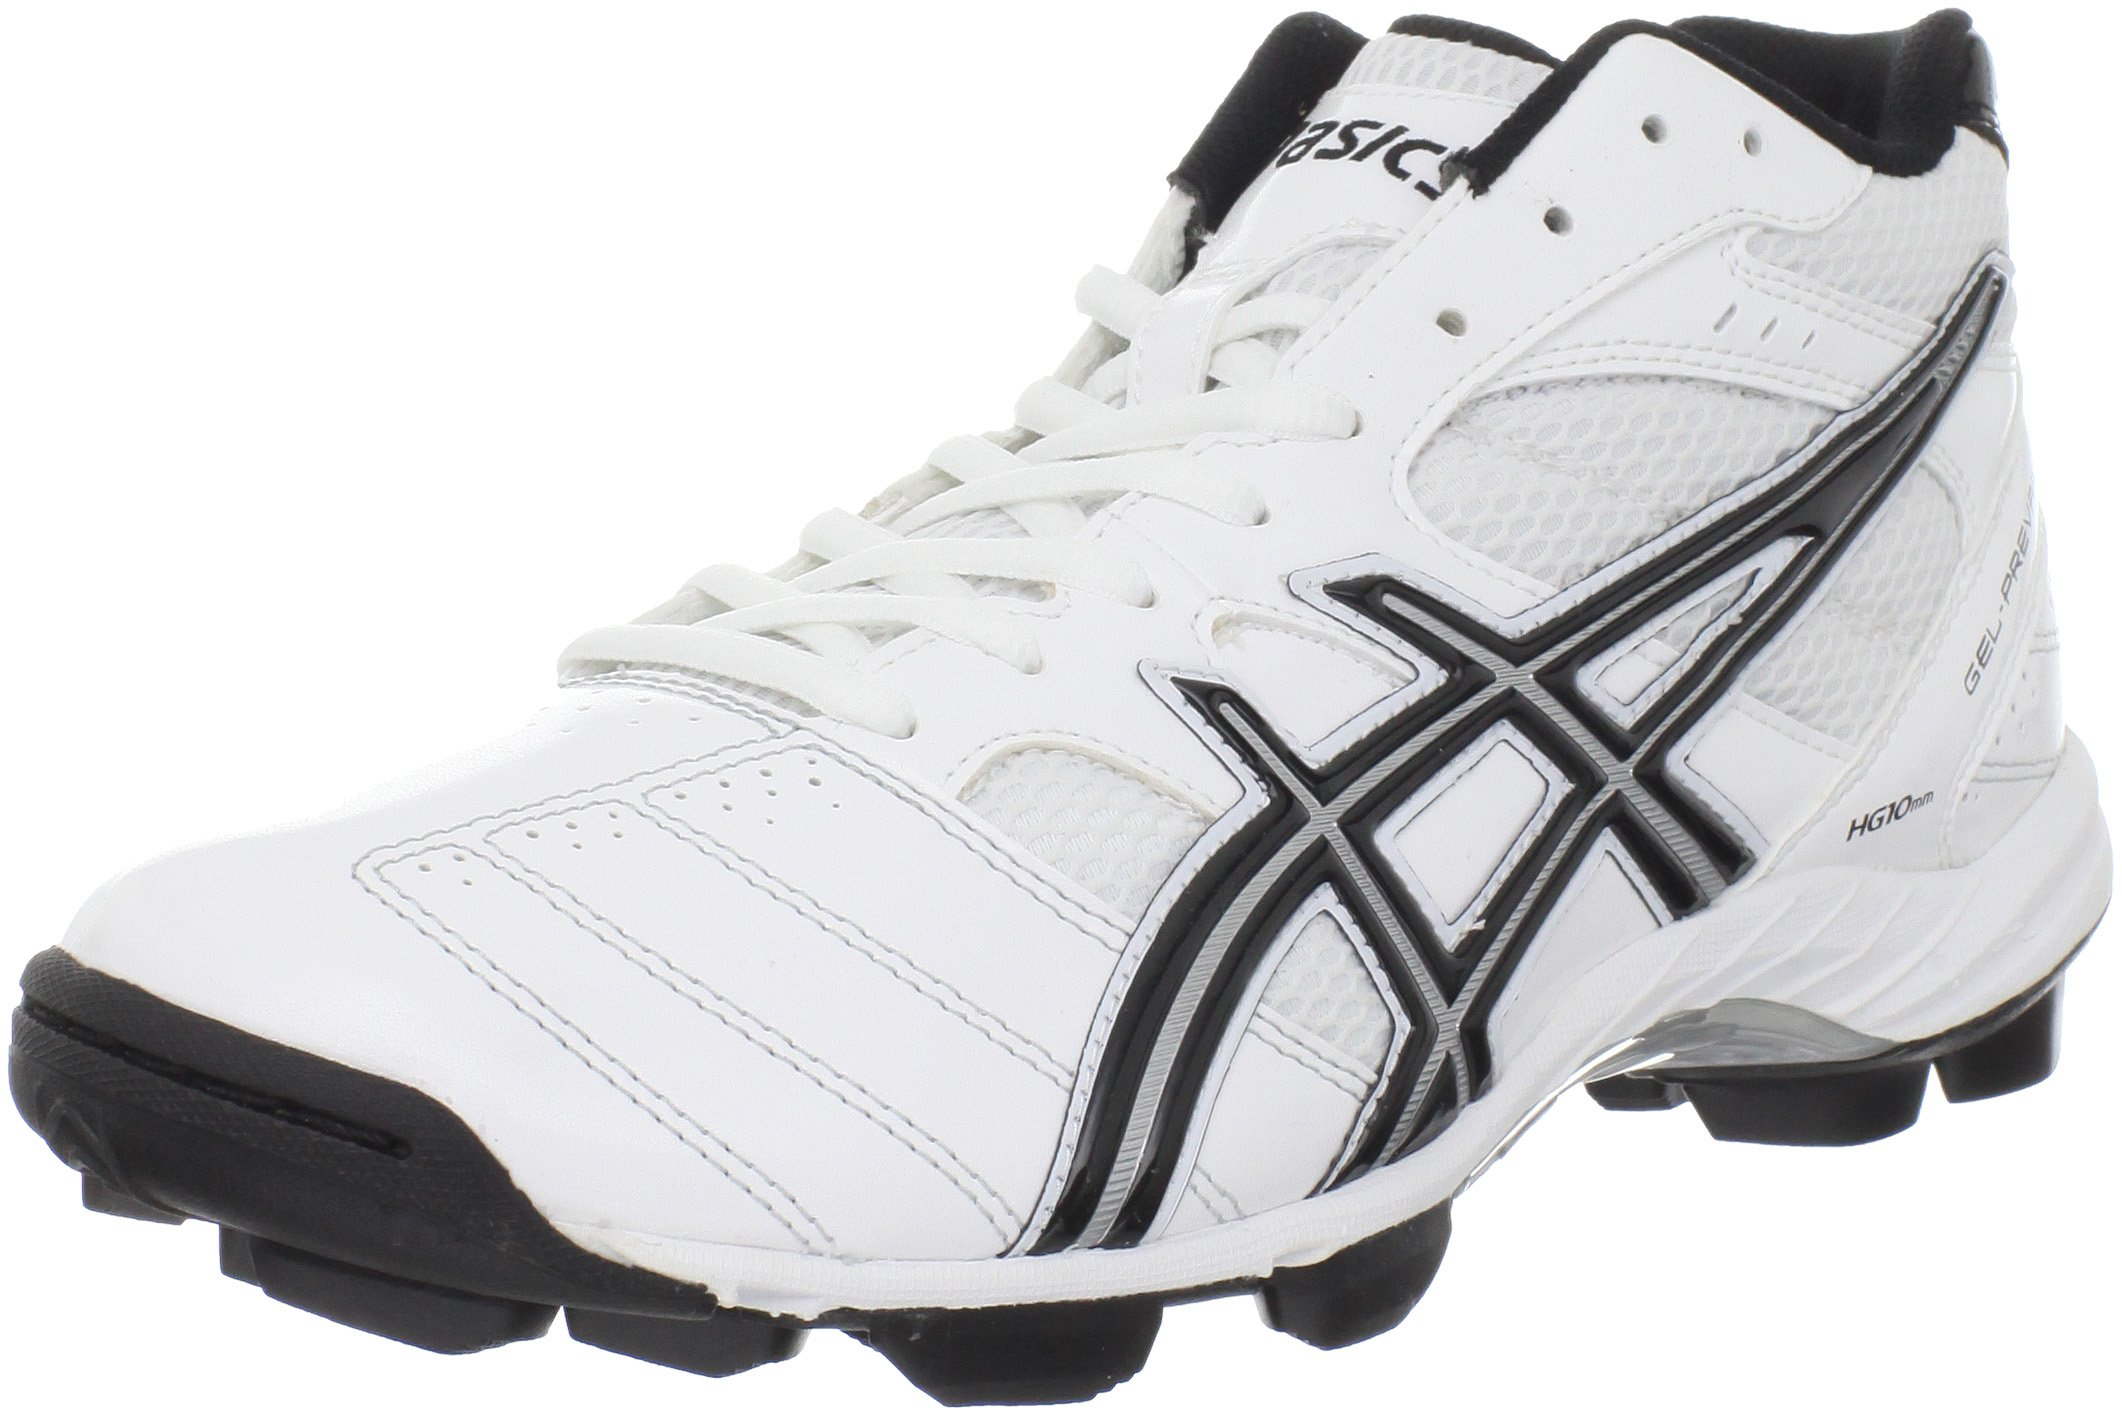 ASICS Men's GEL-Prevail Mid Lacrosse Shoe,White/Black/Silver,13 M US by ASICS